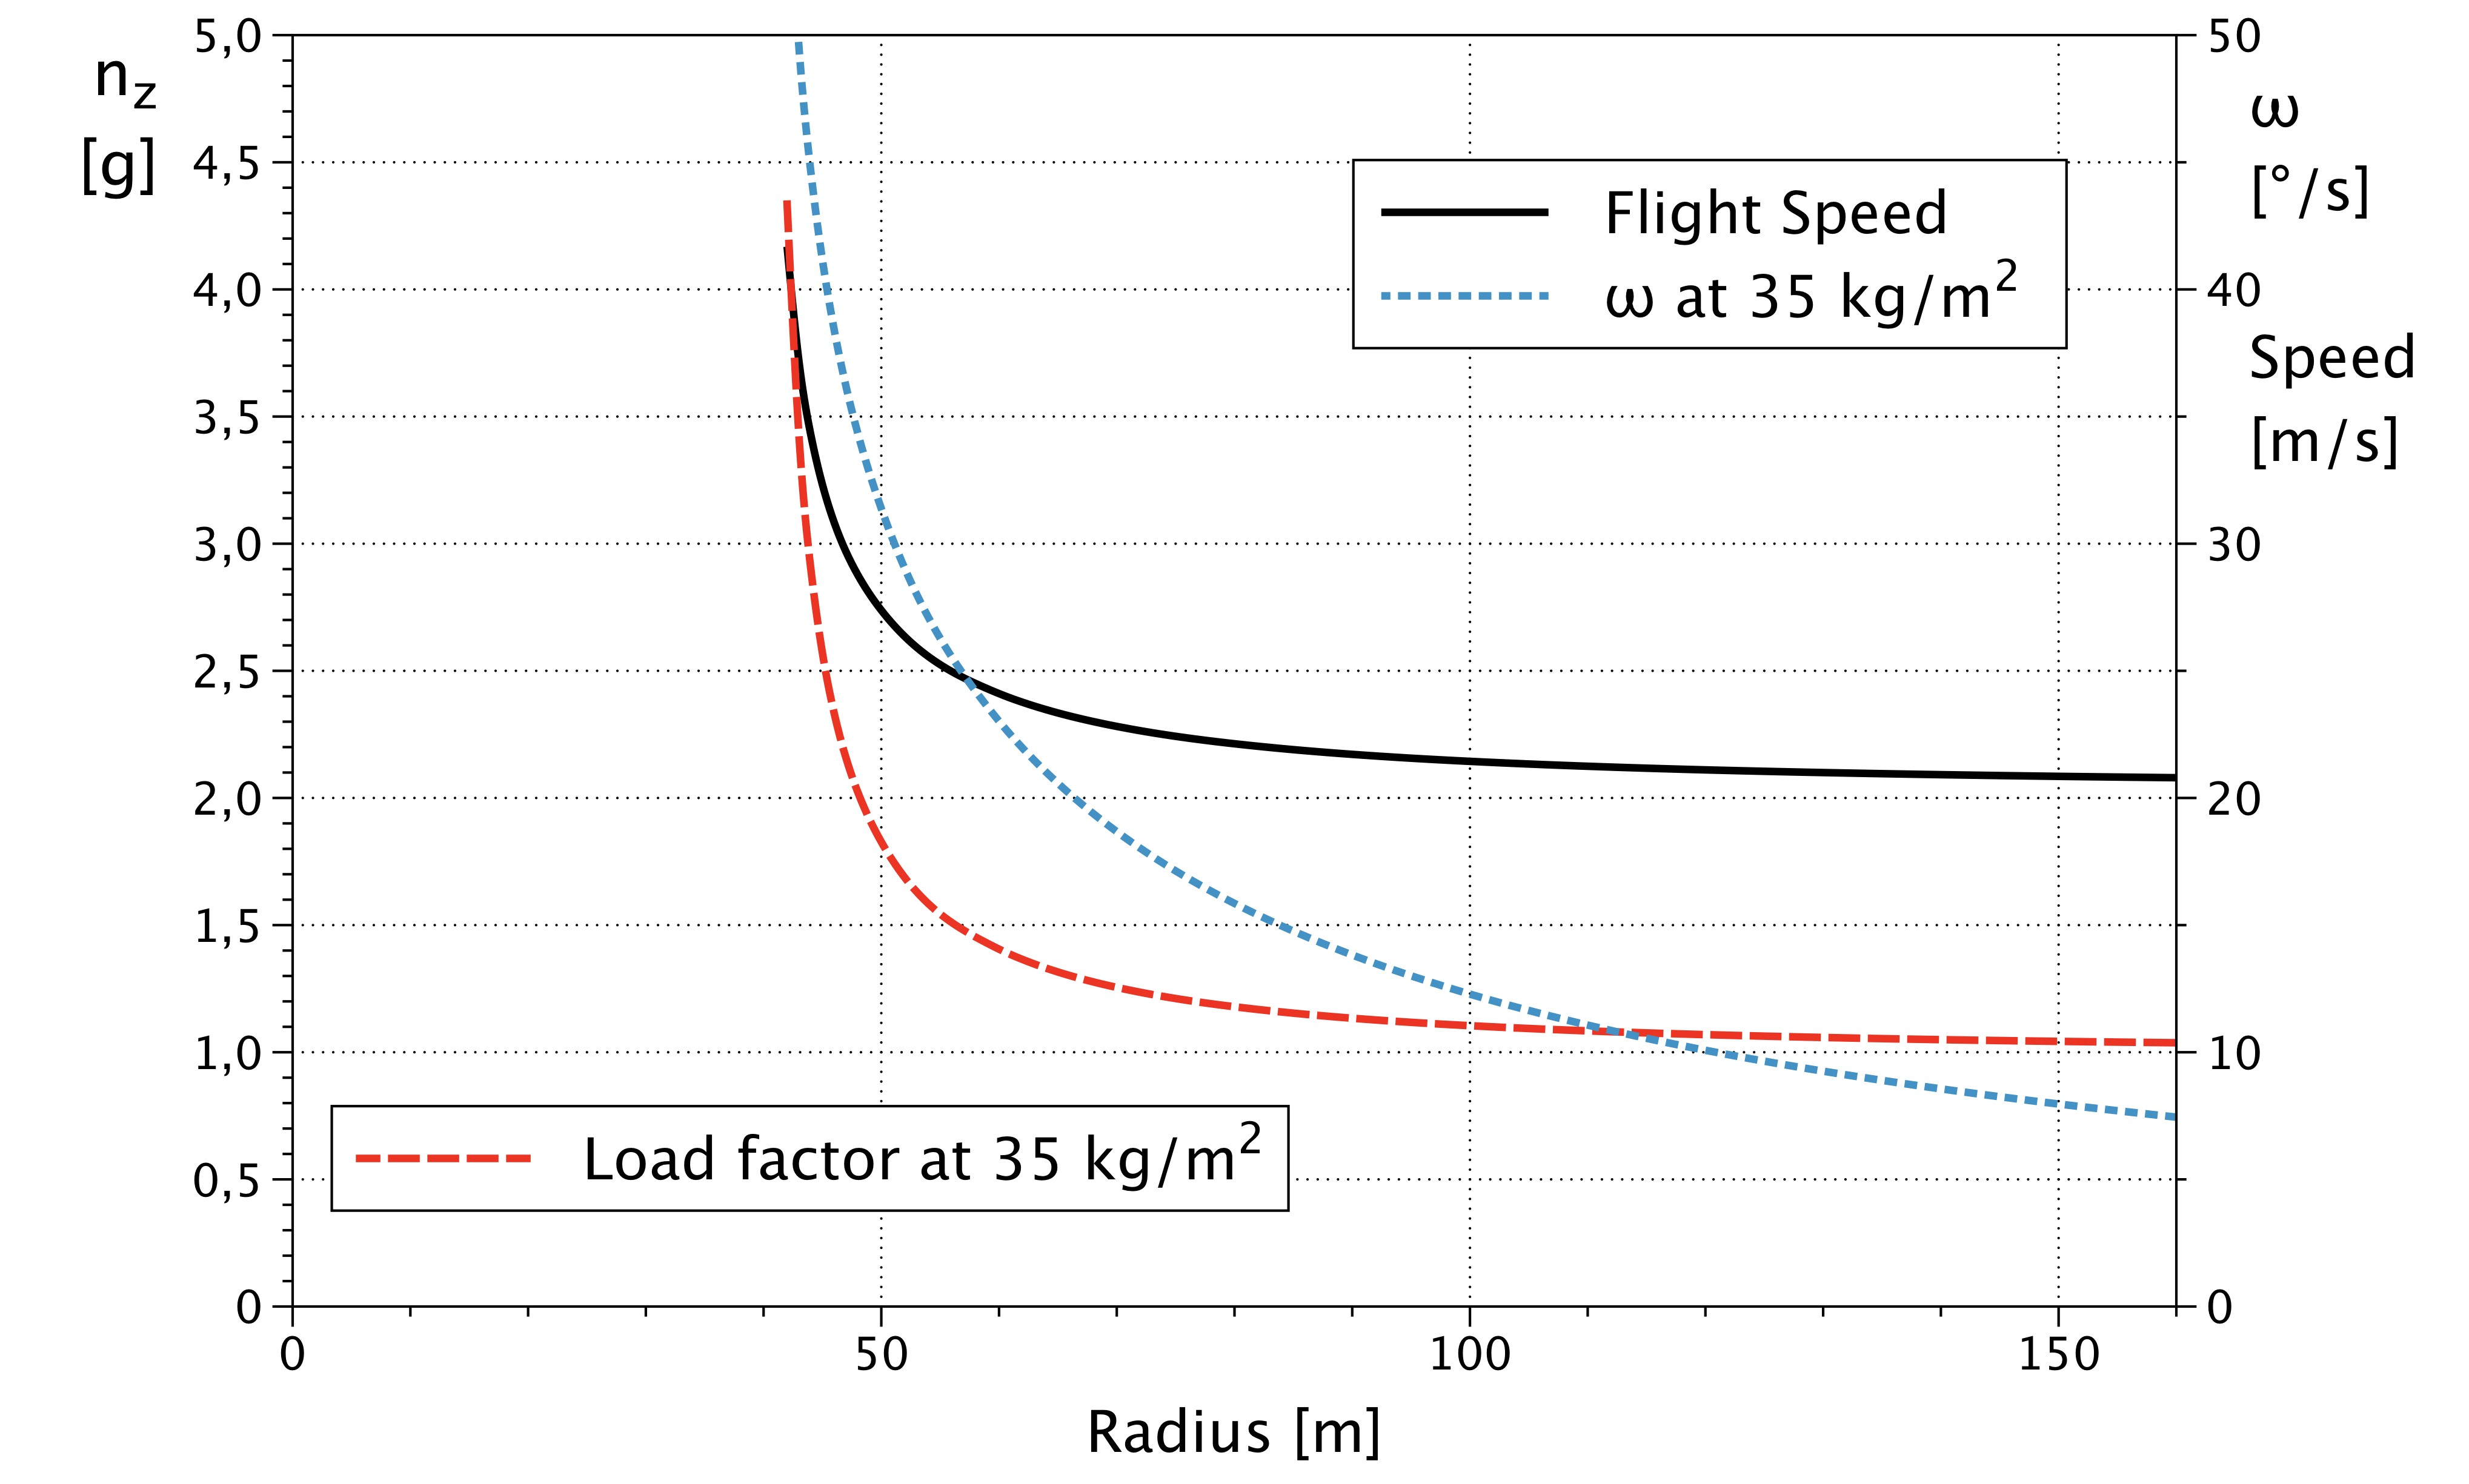 Car Turning Radius Diagram Aerodynamics How to Calculate Angular Velocity and Radius Of A